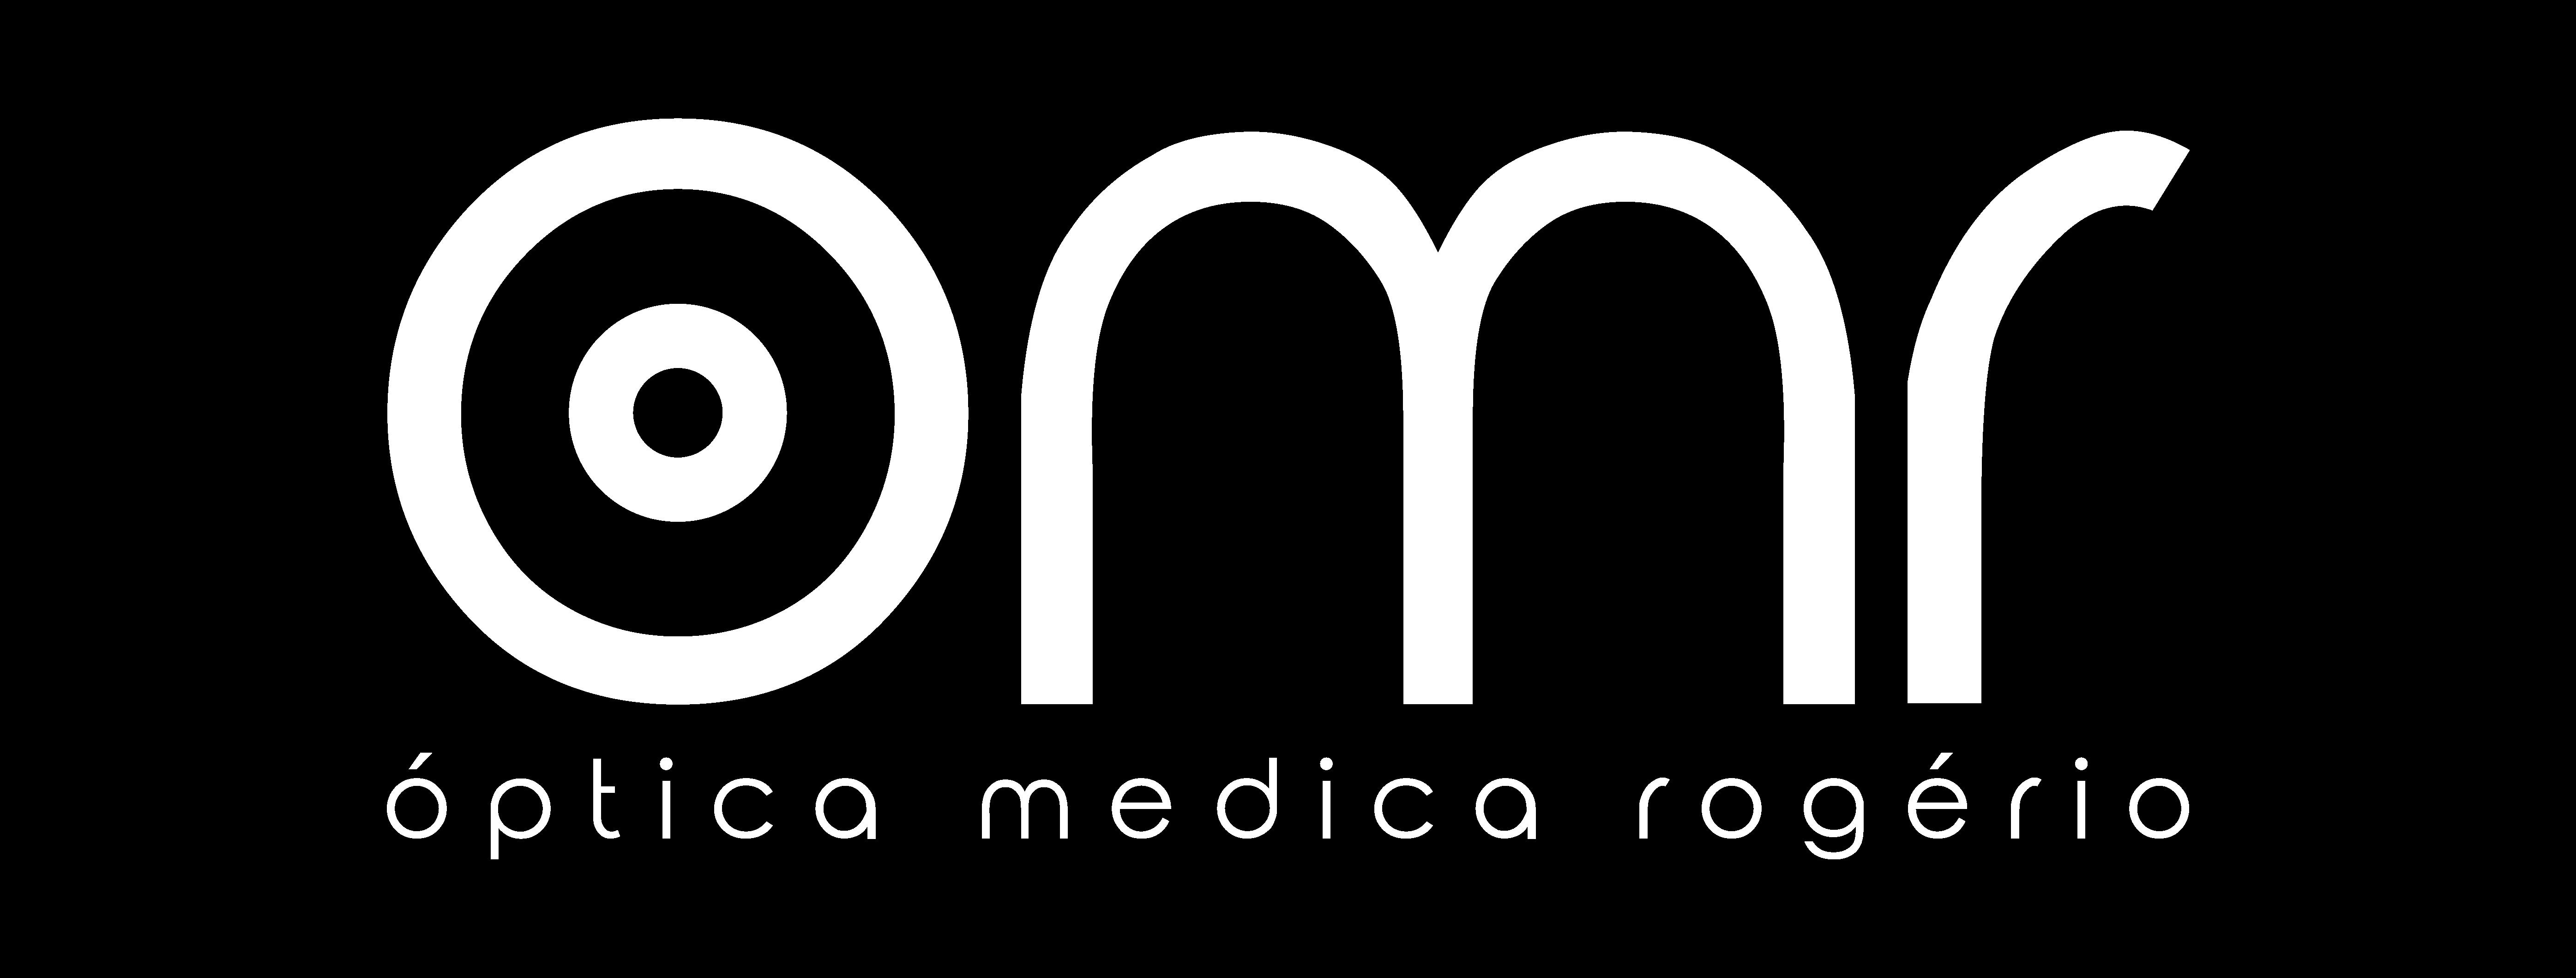 Óptima Médica Rogério